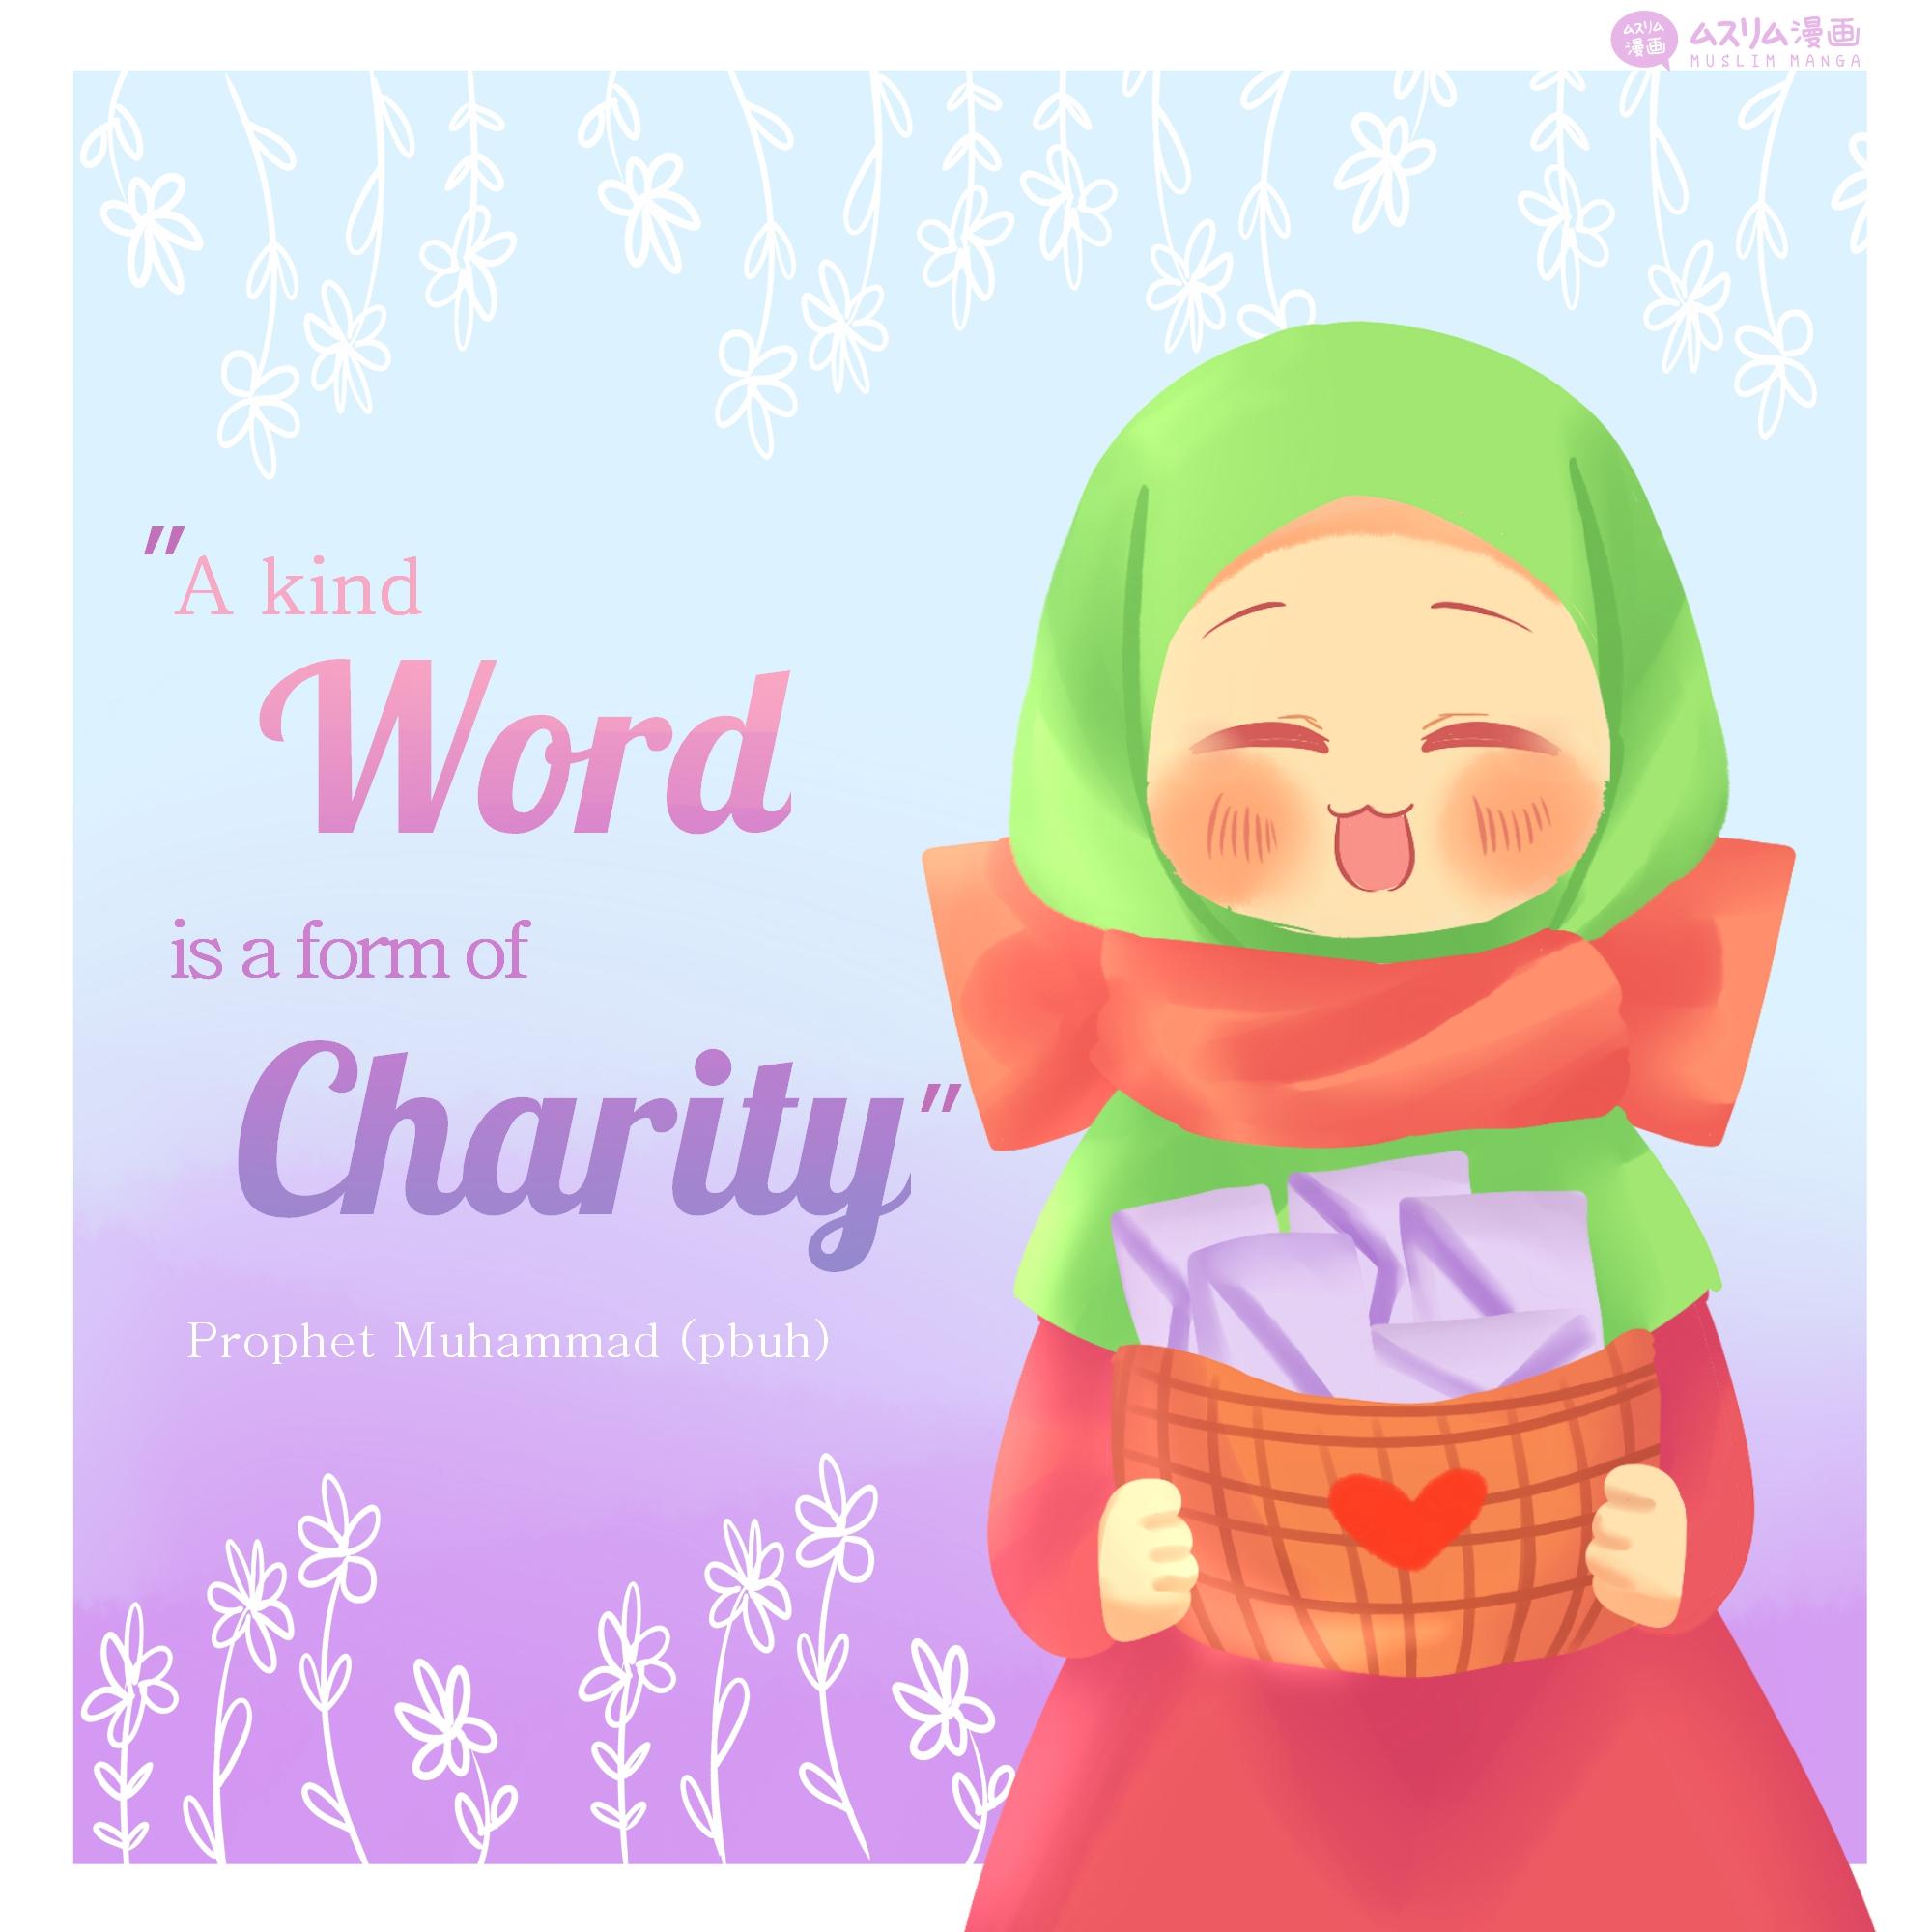 a kind word